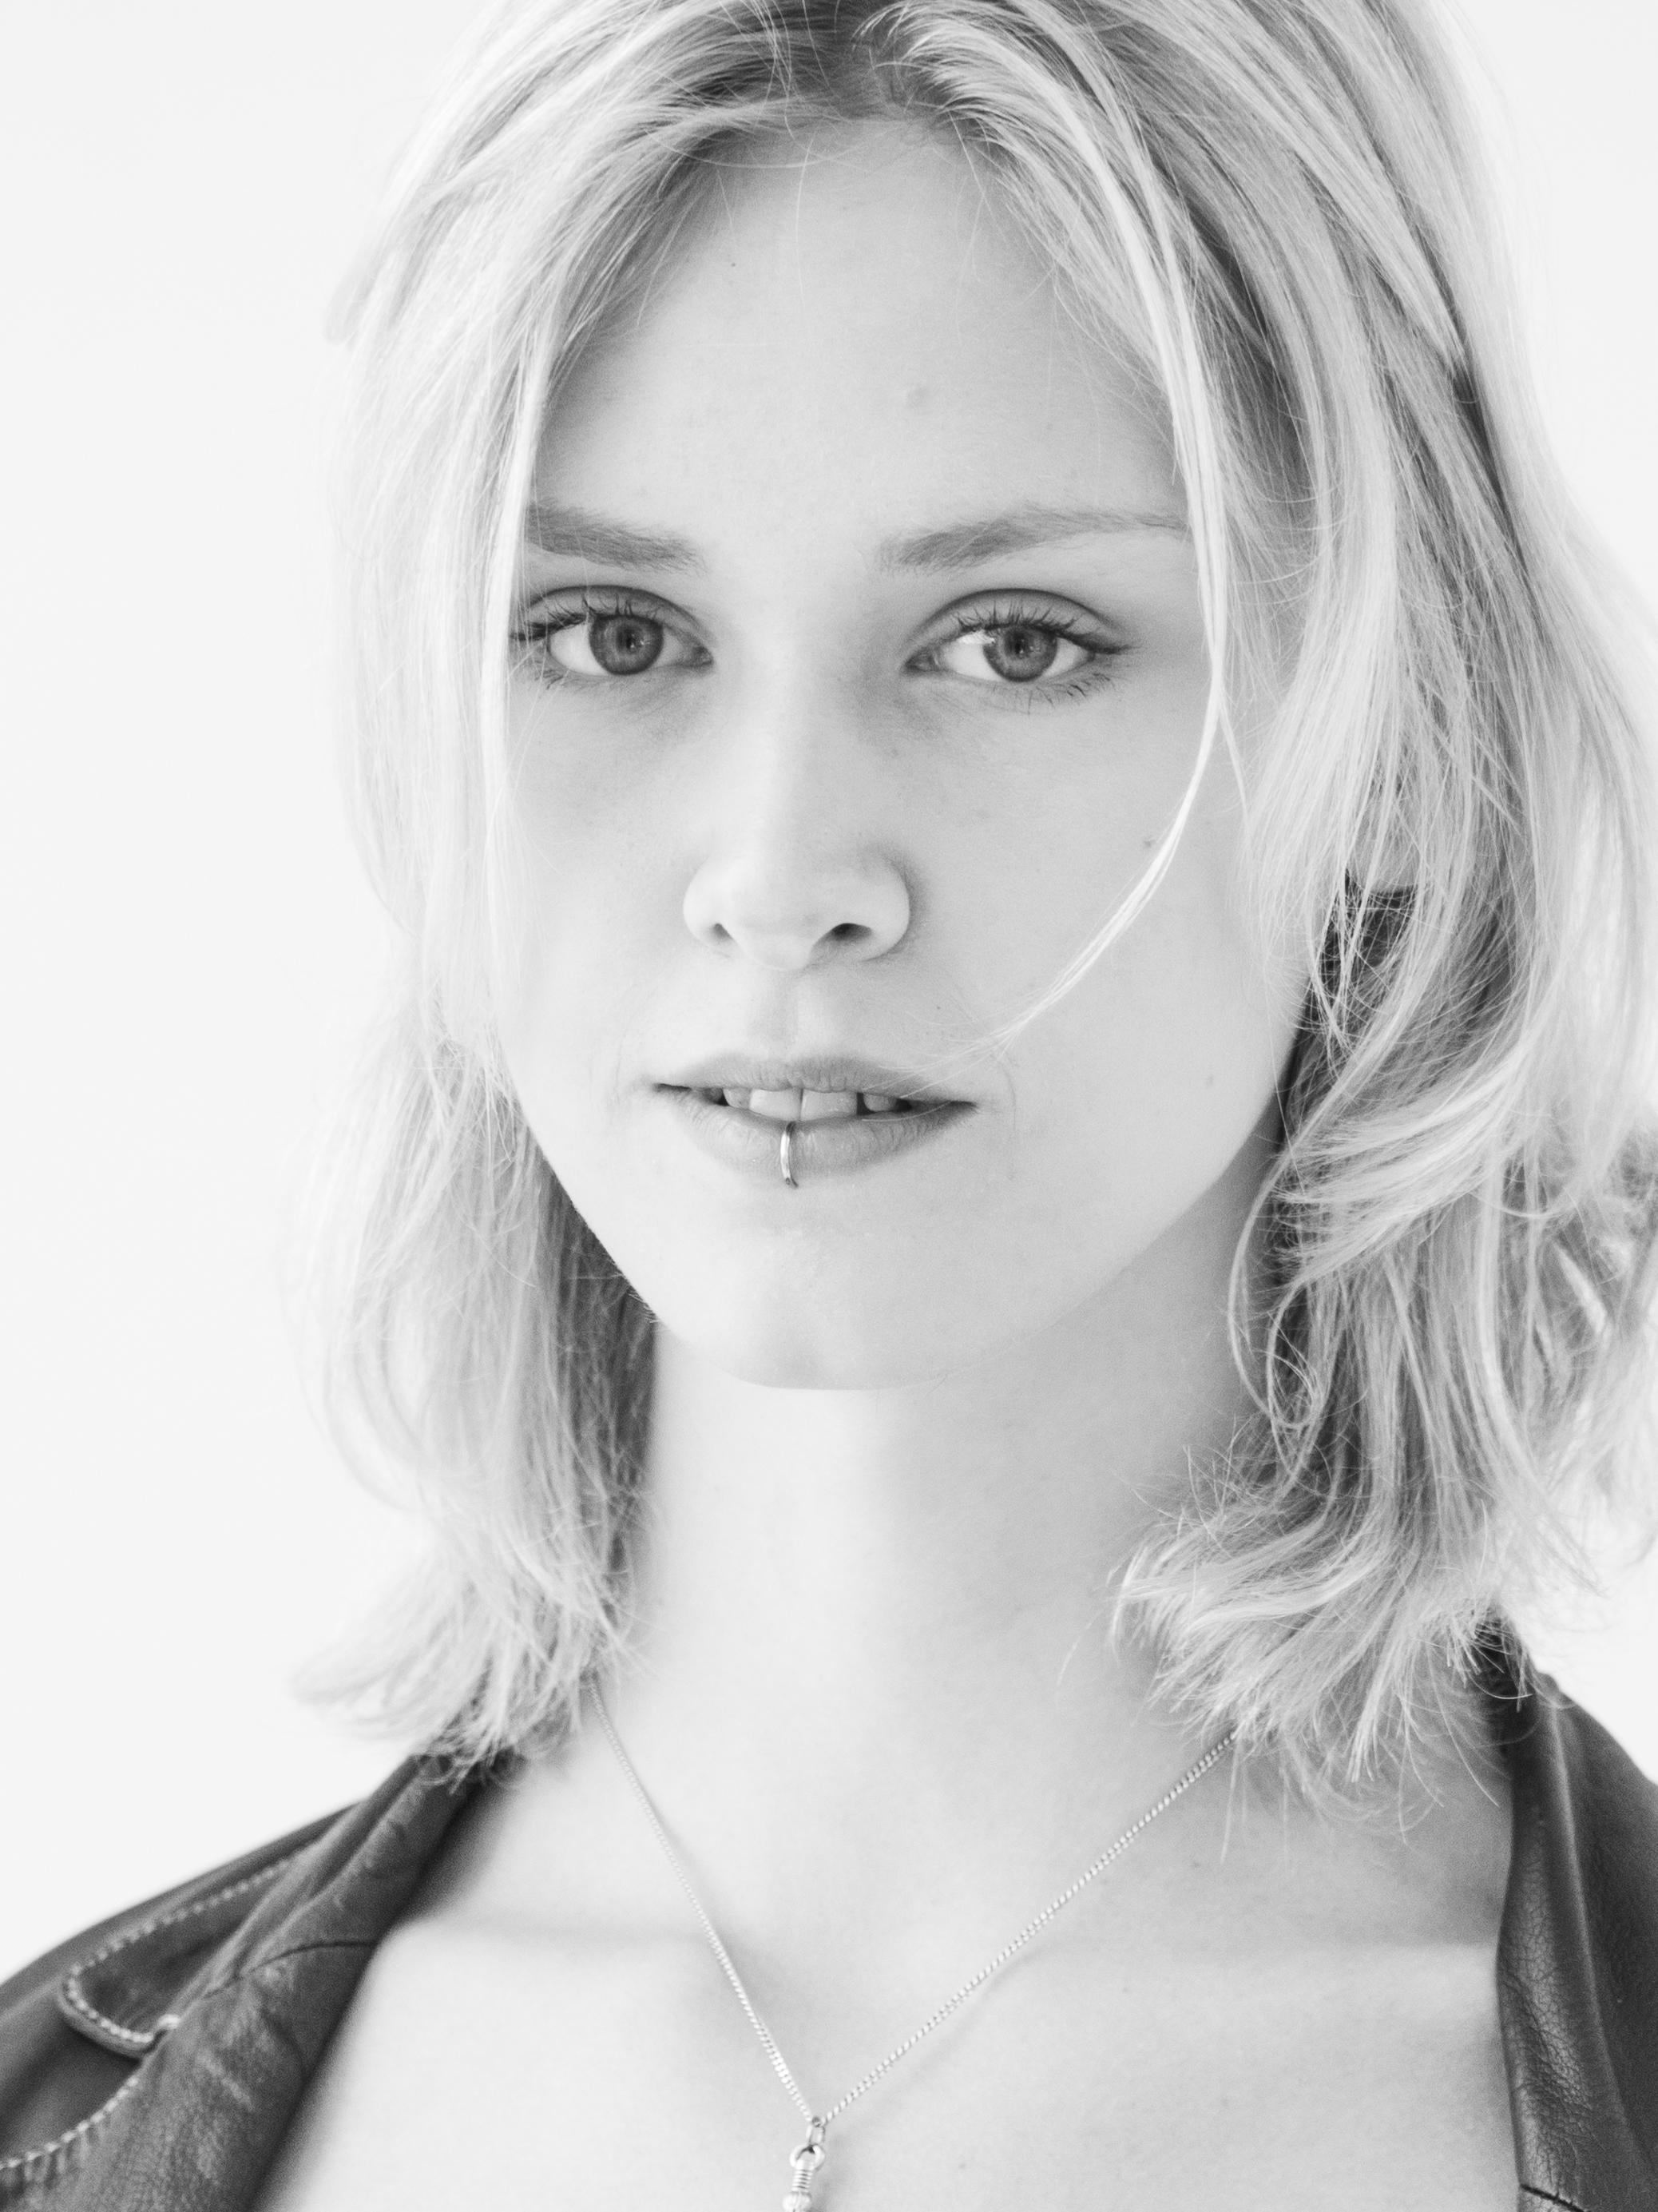 Freya Jo Hyldgaard Jensen